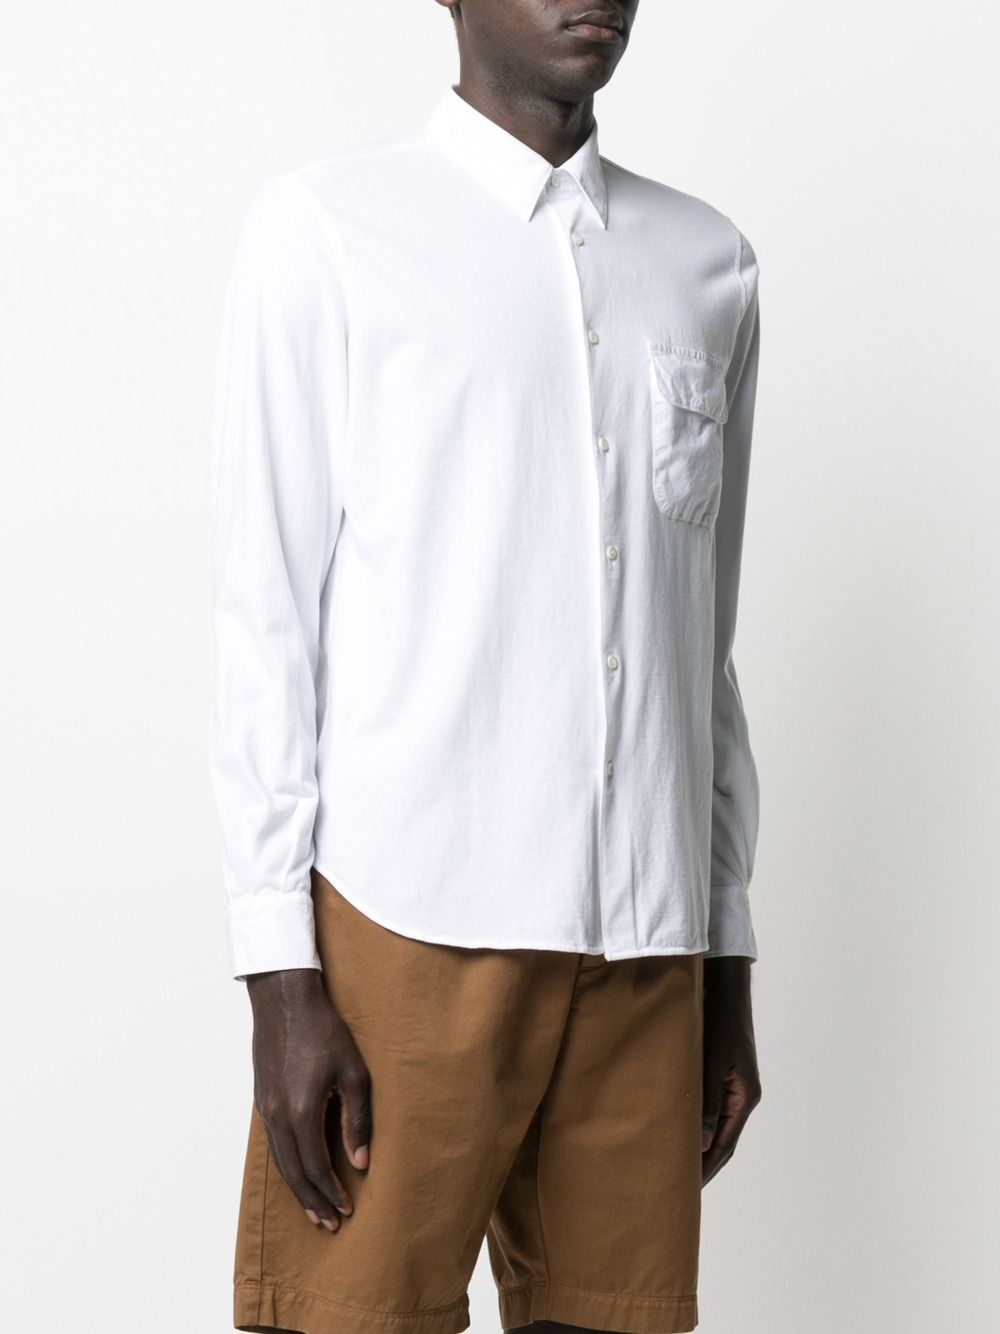 White cotton long-sleeved shirt featuring classic collar ASPESI |  | AY46-940885072